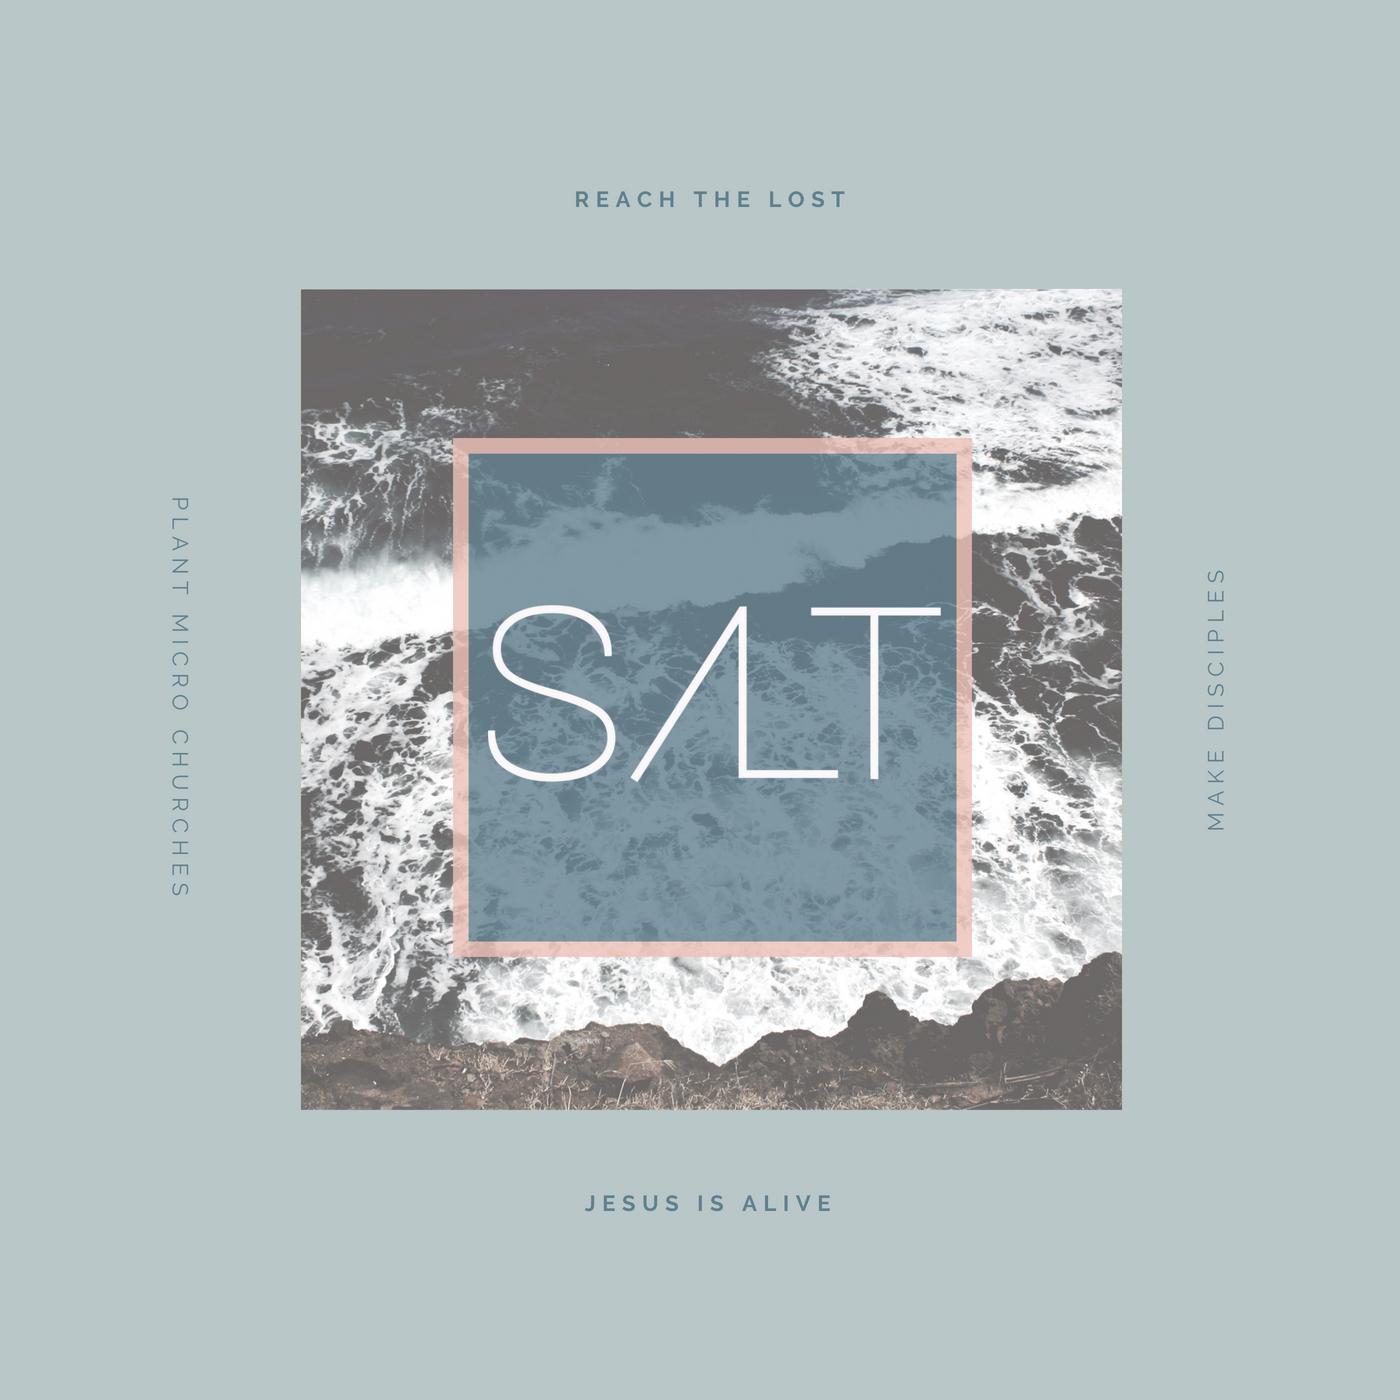 salt podcast art 2 2.jpg